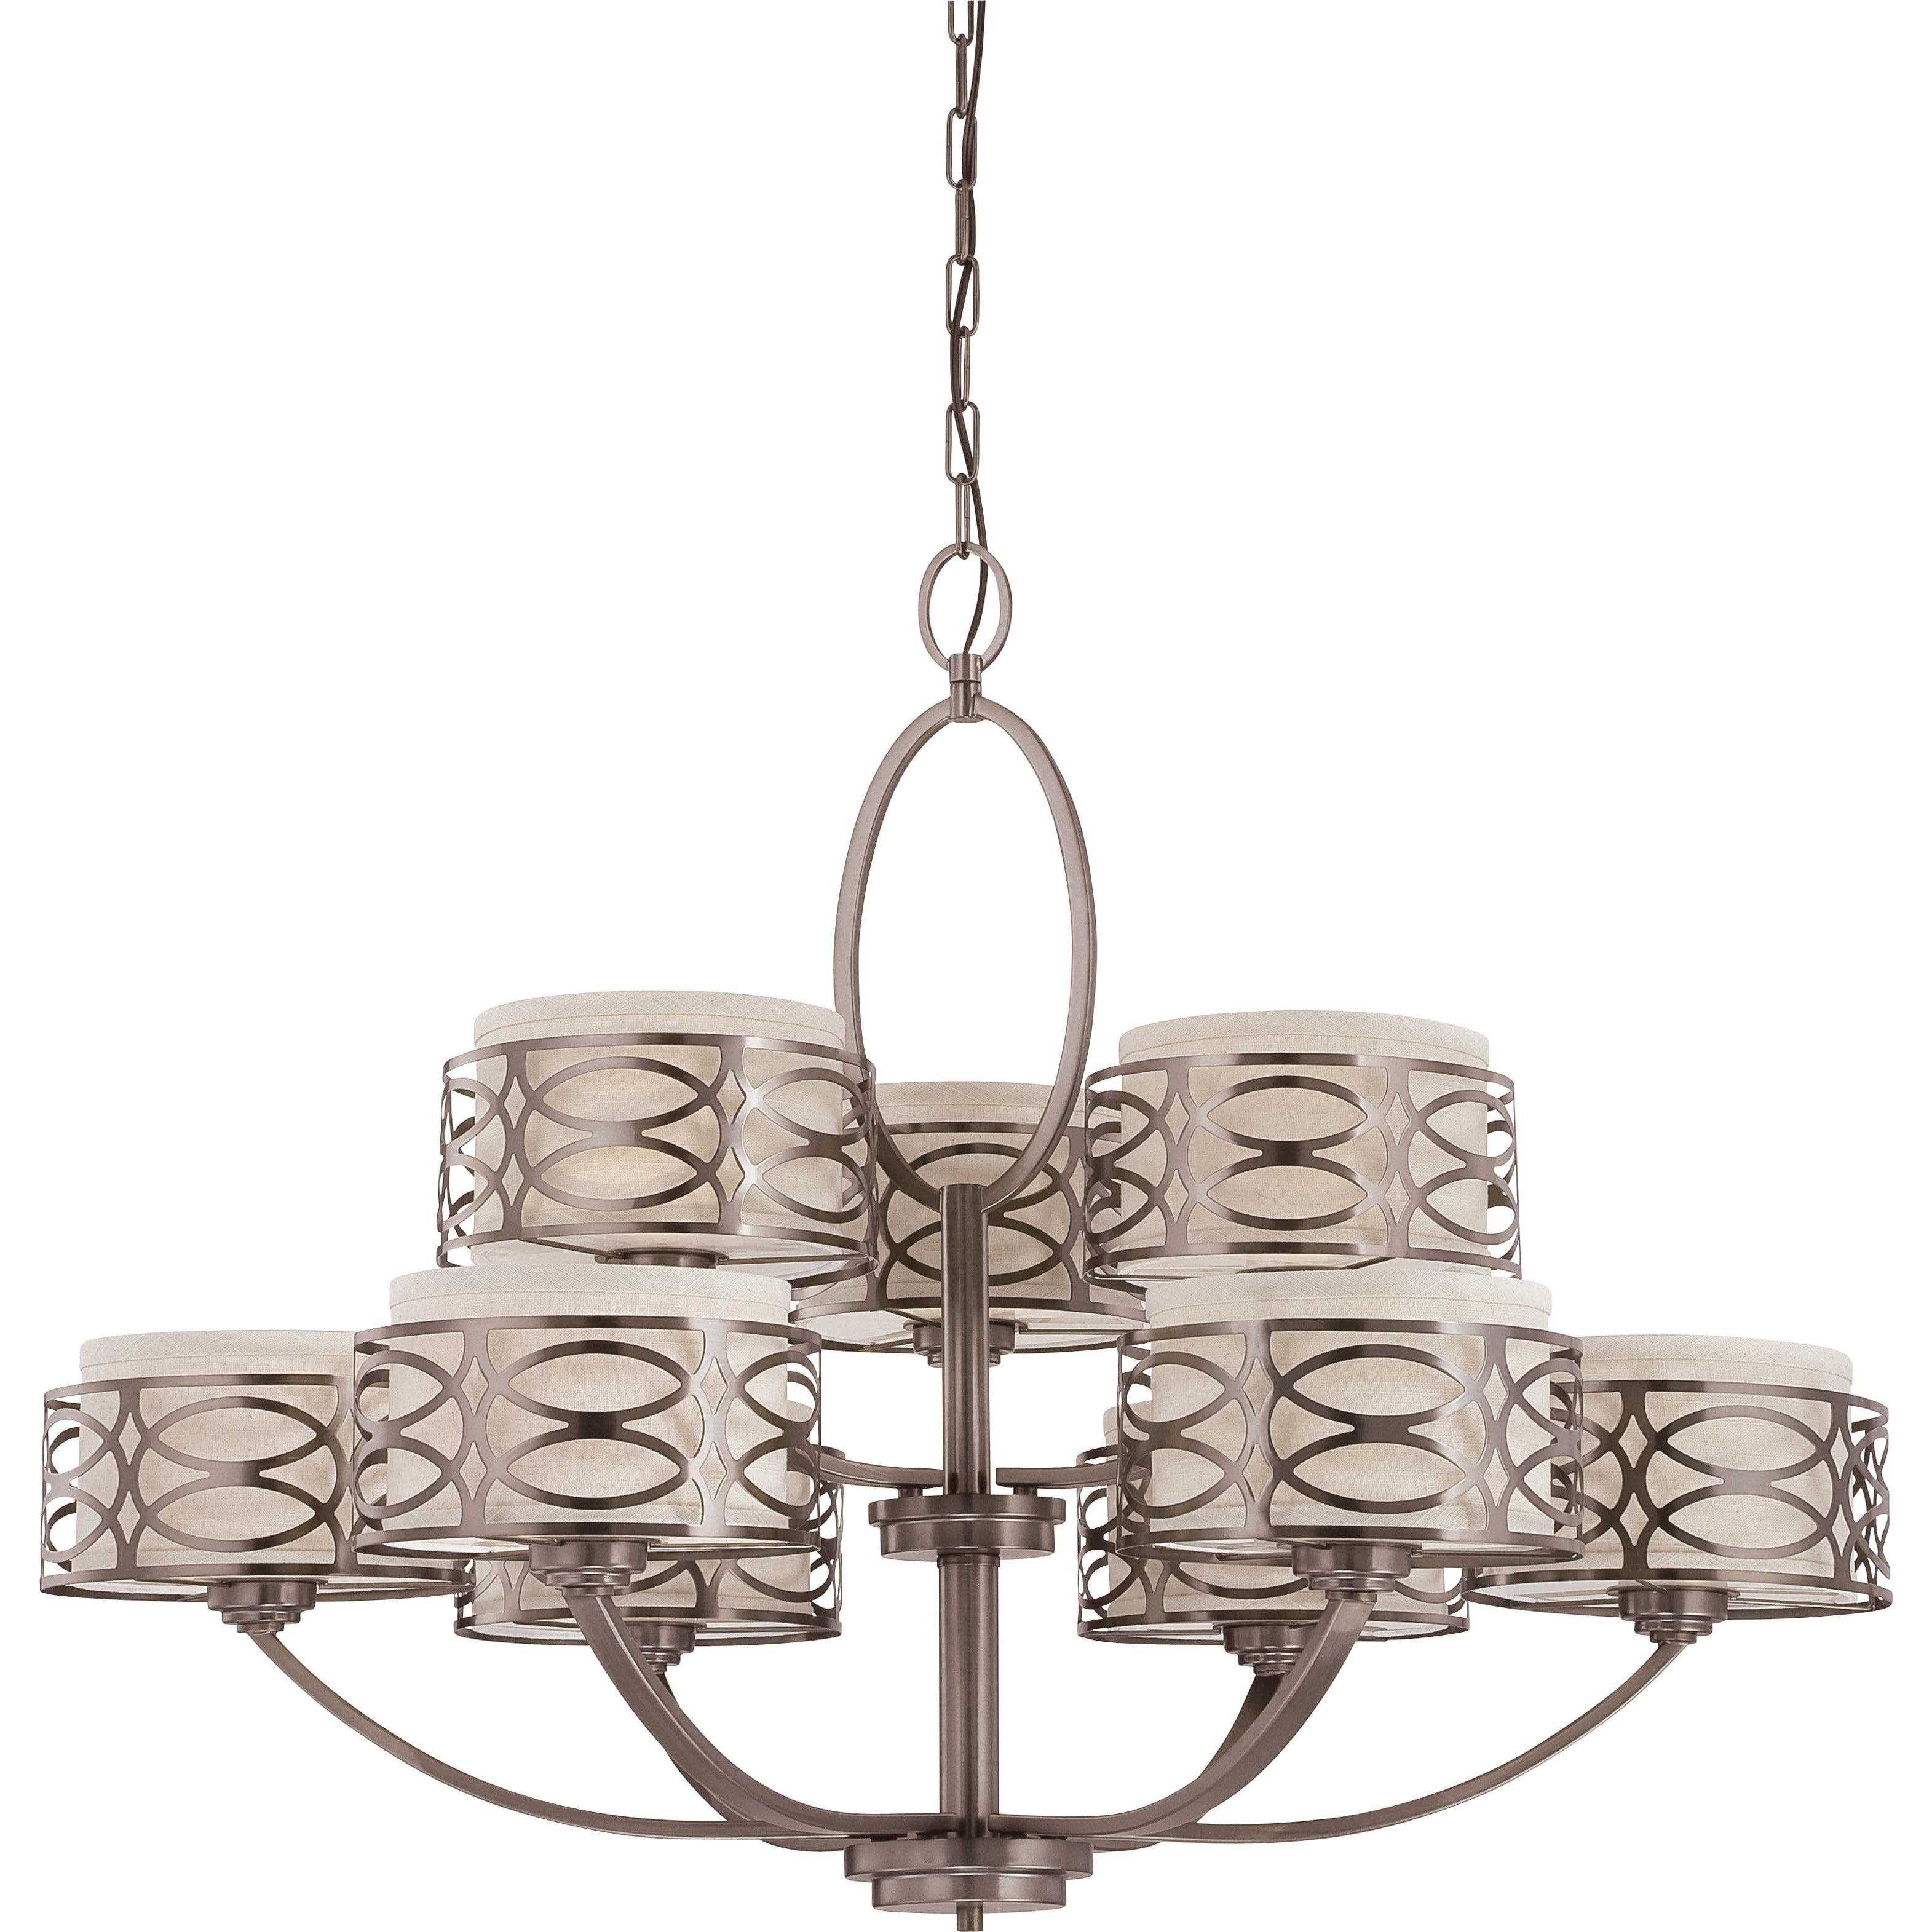 Harlow Bronze all Khaki Fabric Shades 9-Light Chandelier